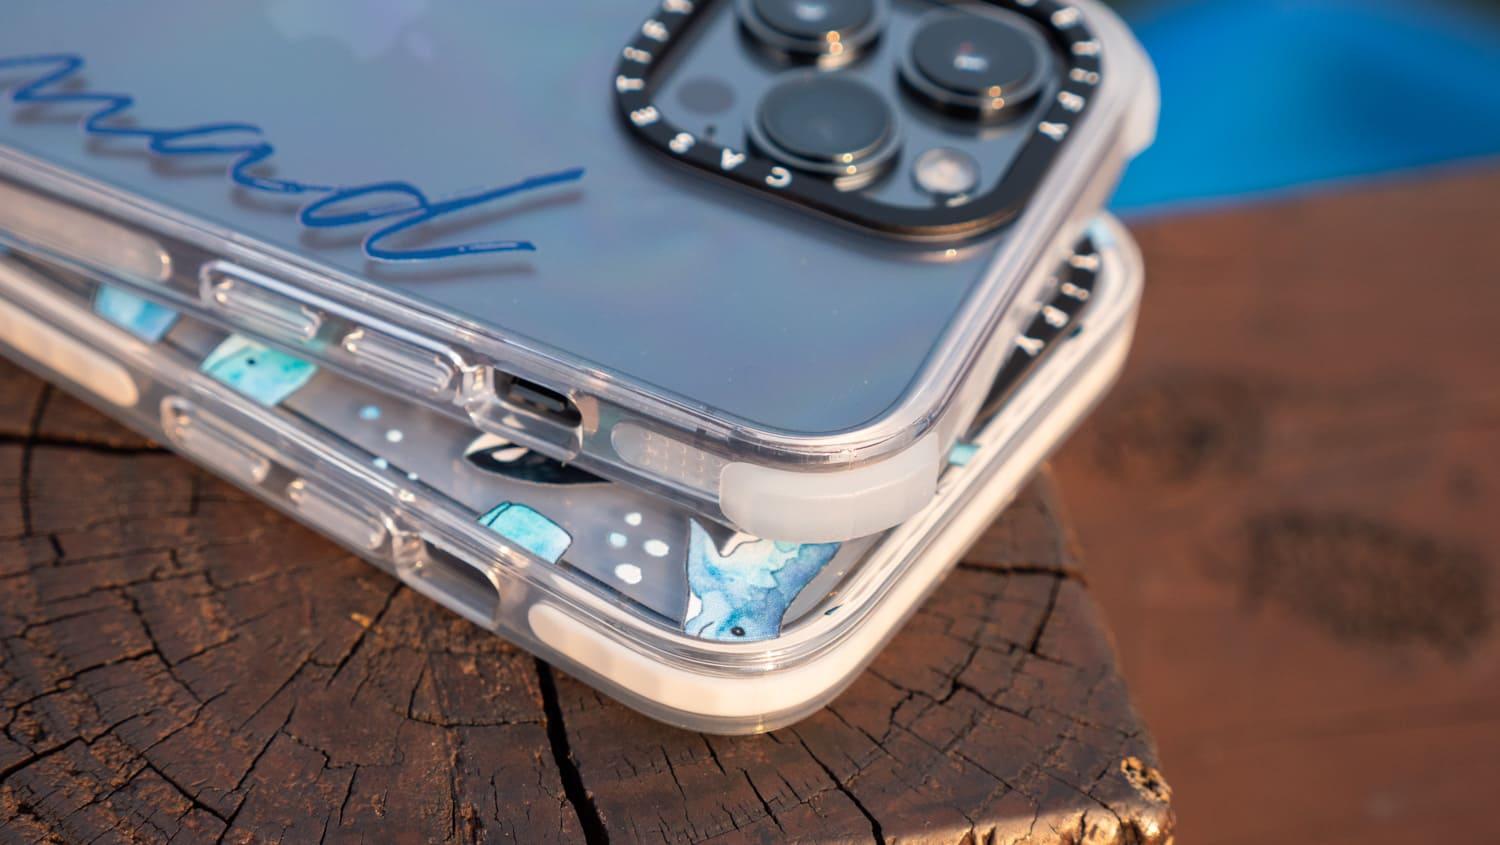 CASETiFY 高度客製化手機殼5